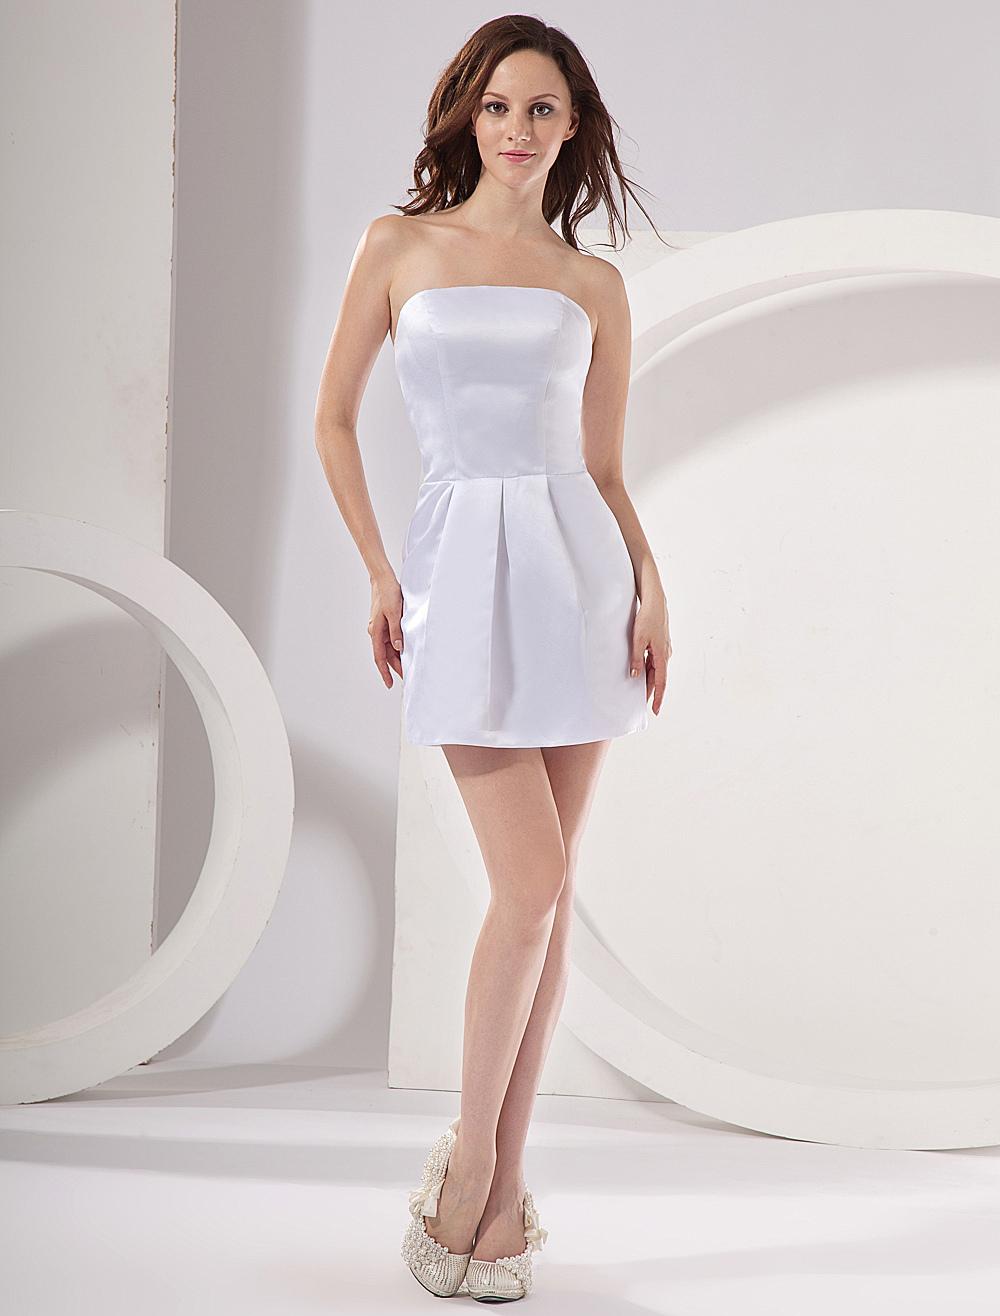 Cute White Strapless Satin Womens Homecoming Dress (Wedding Cheap Party Dress) photo